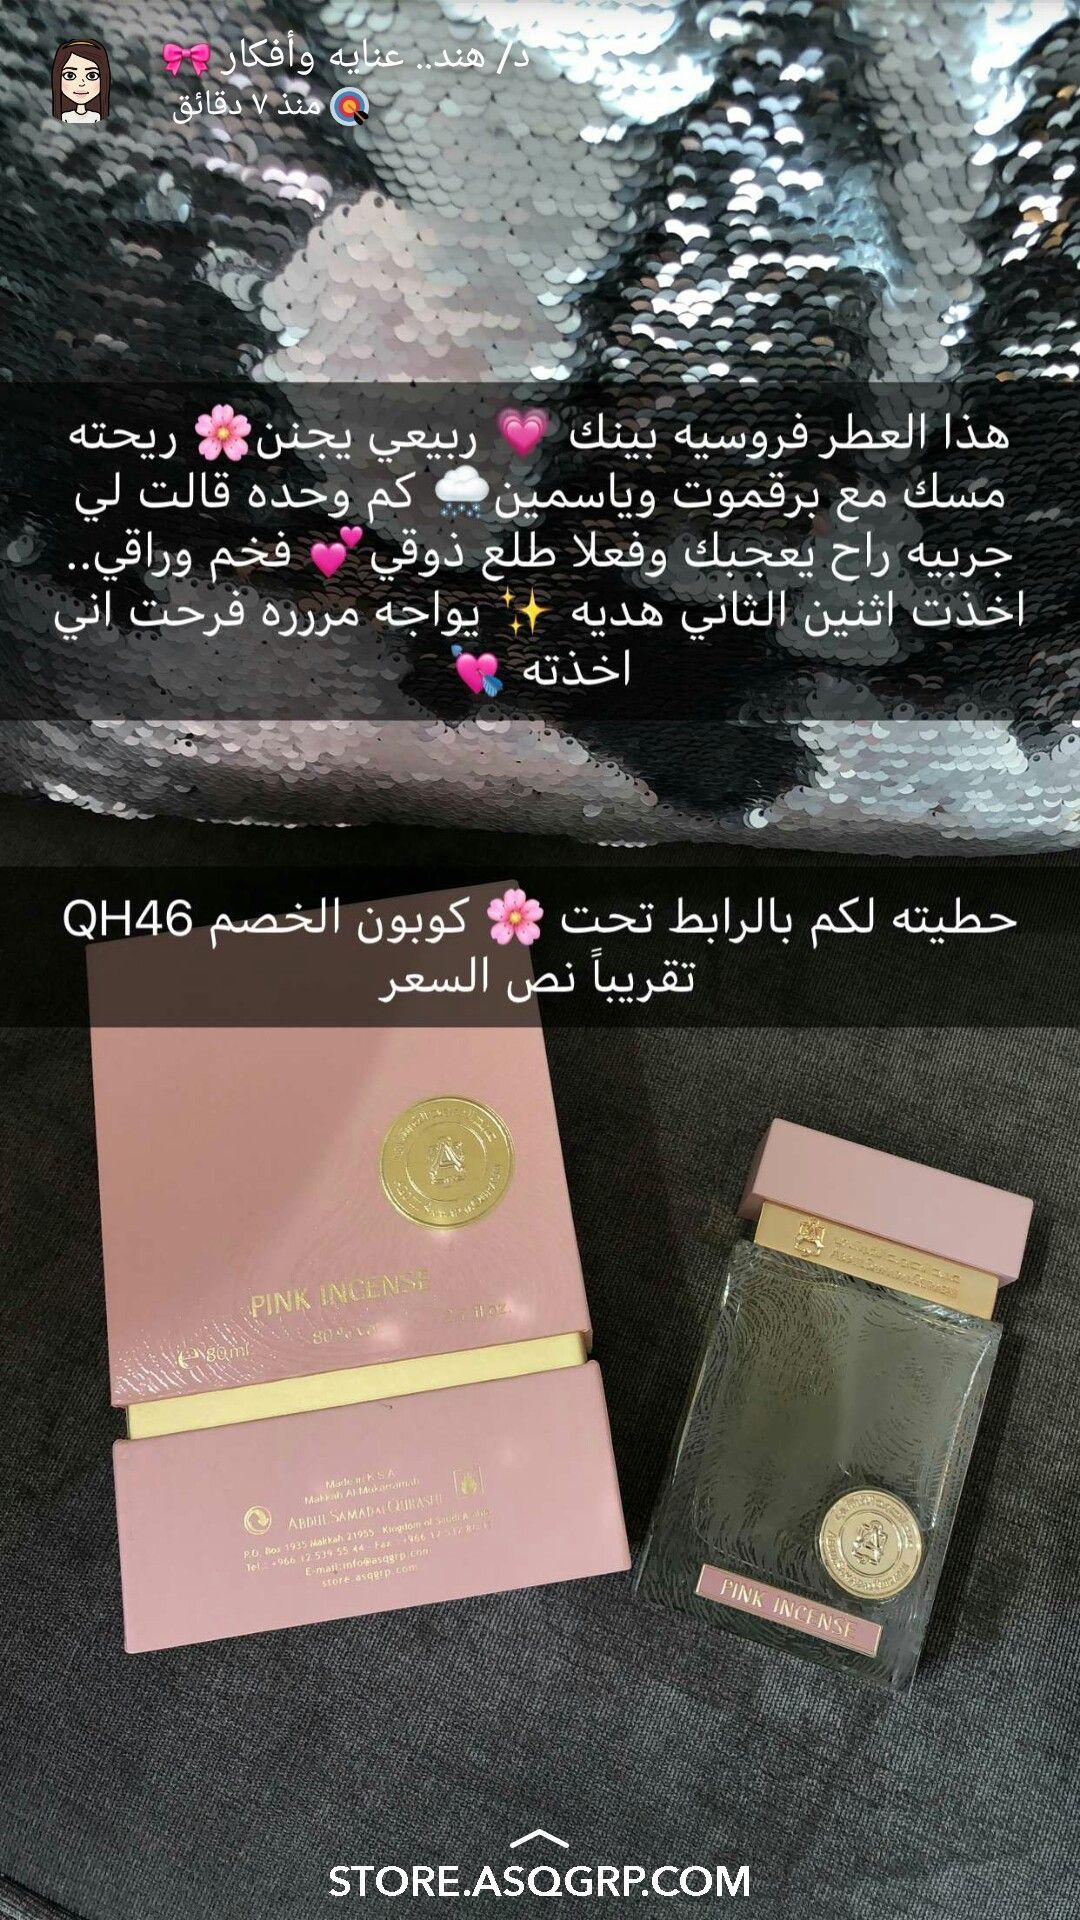 Pink Incense عبدالصمد القرشي Body Smells Beauty Perfume Feminine Fragrance